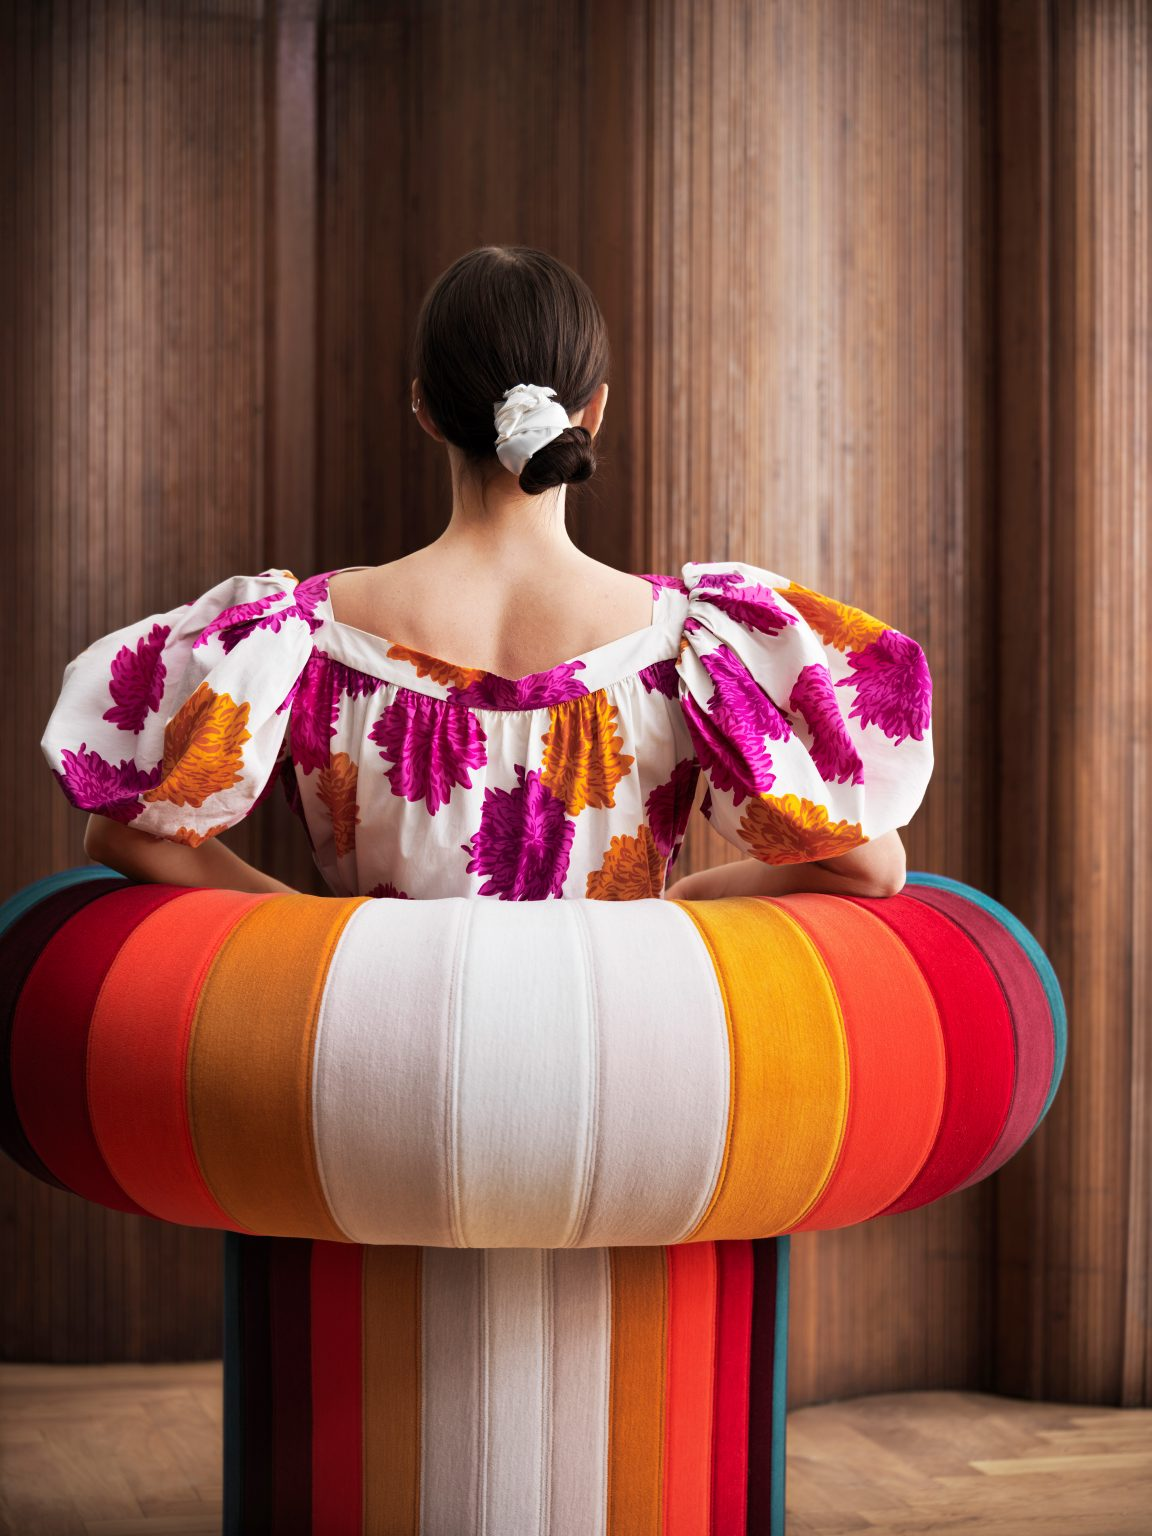 Biennale Interieur - Belgium's leading design and interior event - Big-talk-project-3-new.jpg